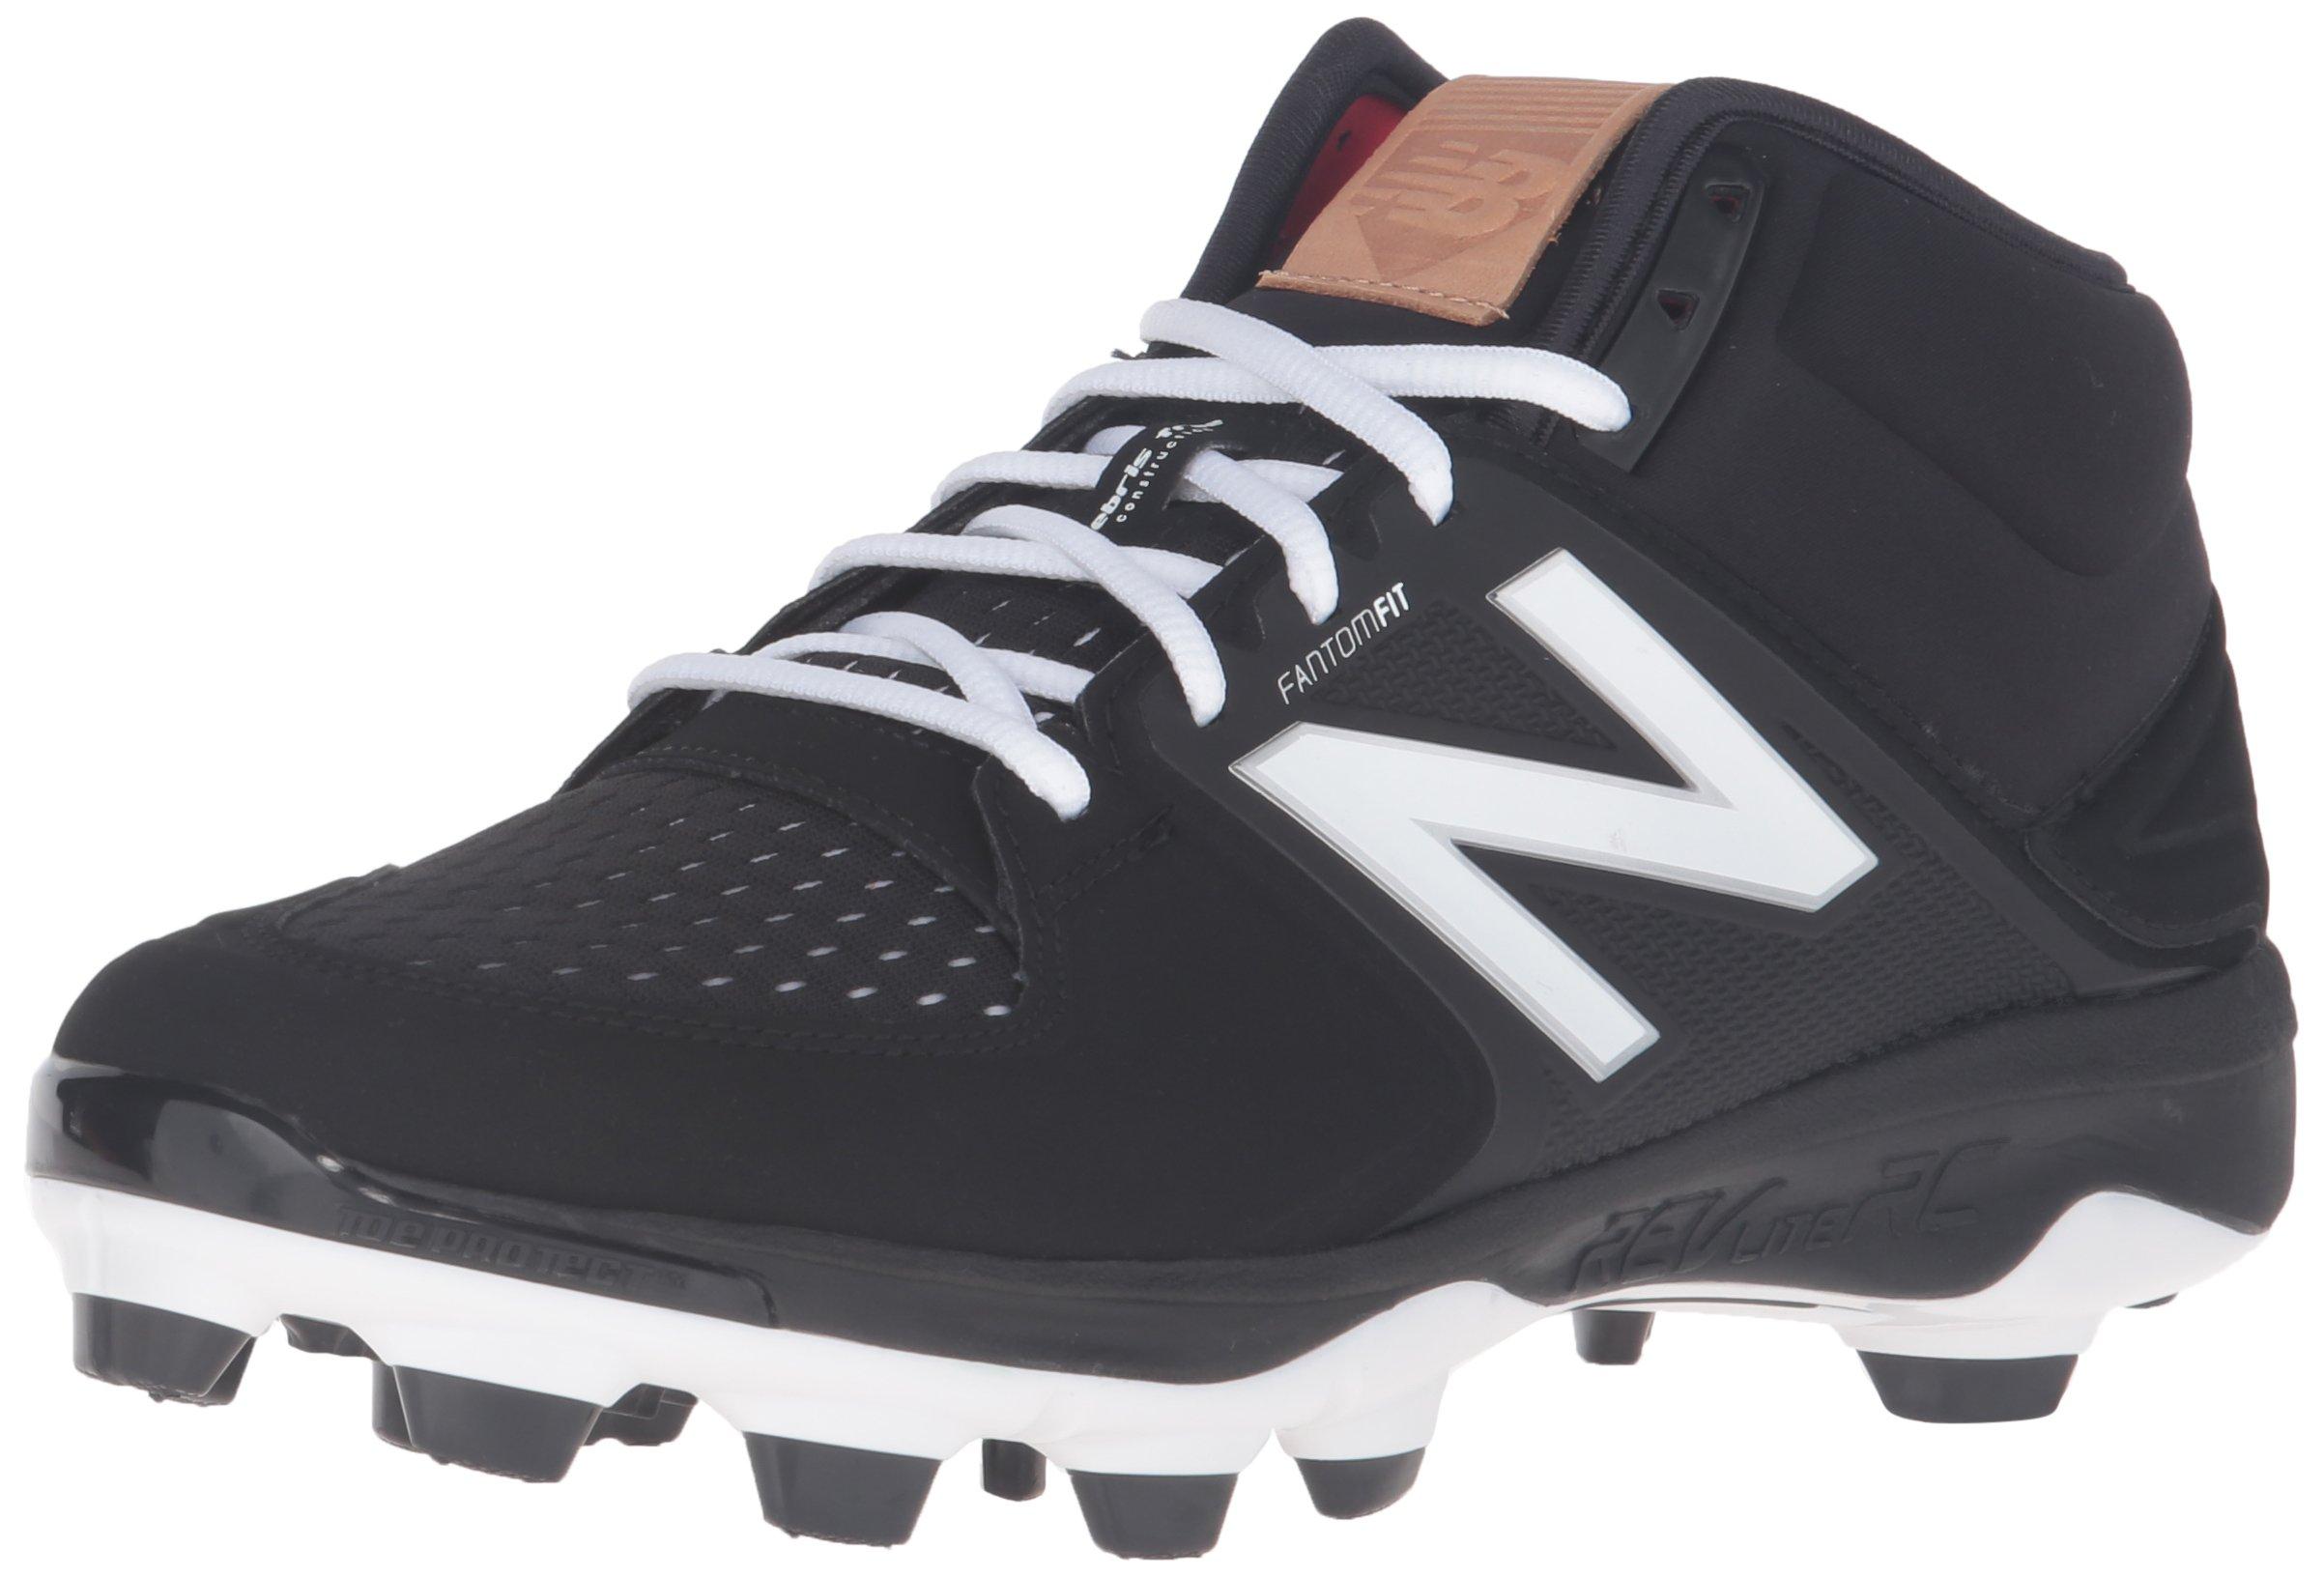 New Balance Men's PM3000V3 Baseball Shoe, Black/Black, 9 D US by New Balance